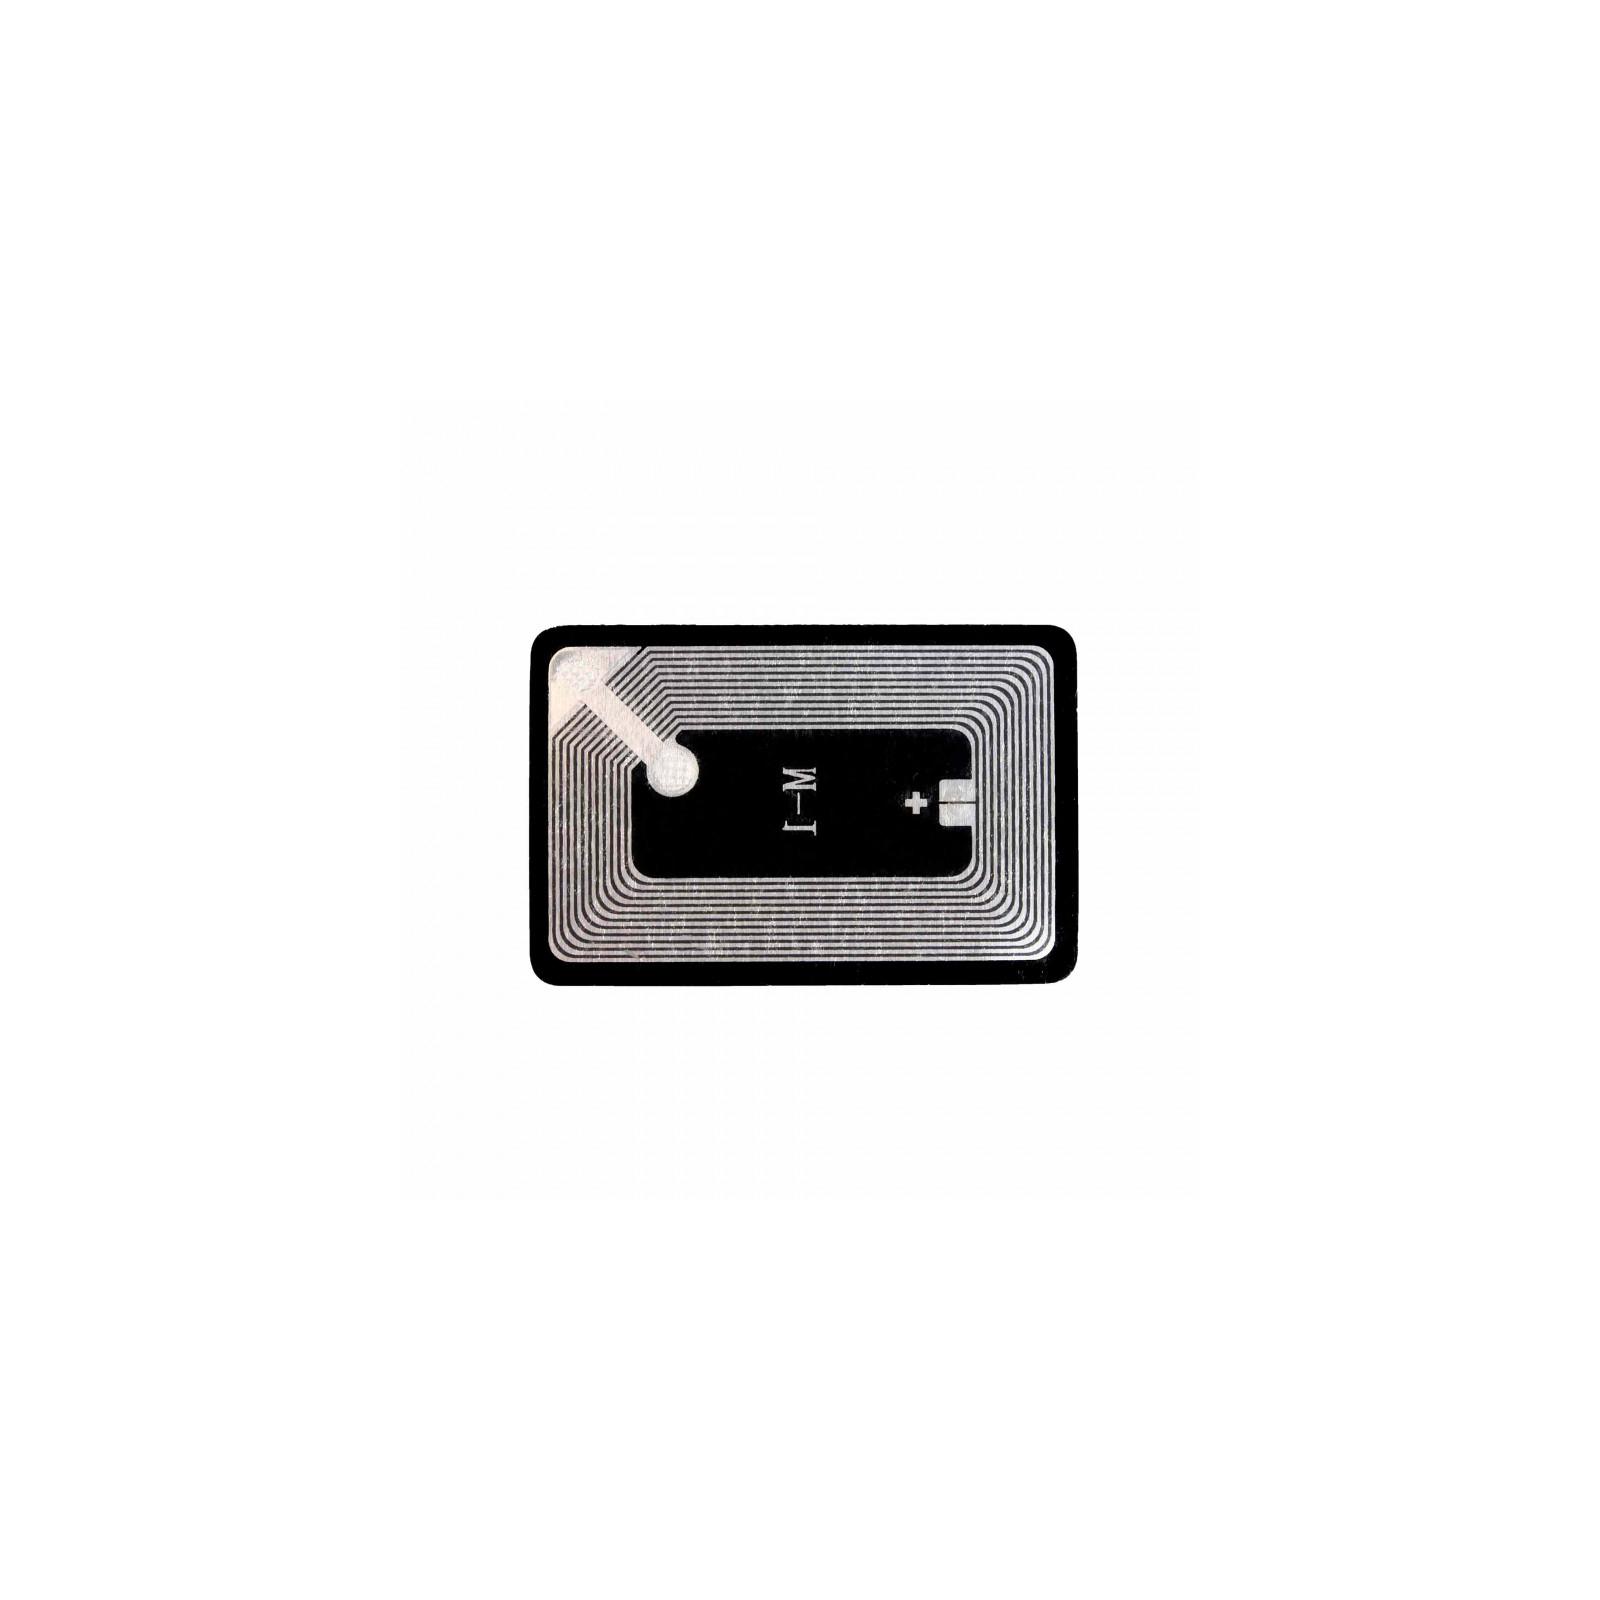 Чип для картриджа Kyocera TK-350 (EU/MEA) 30.8k (MPS) Static Control (MPSTK350CP-EU)